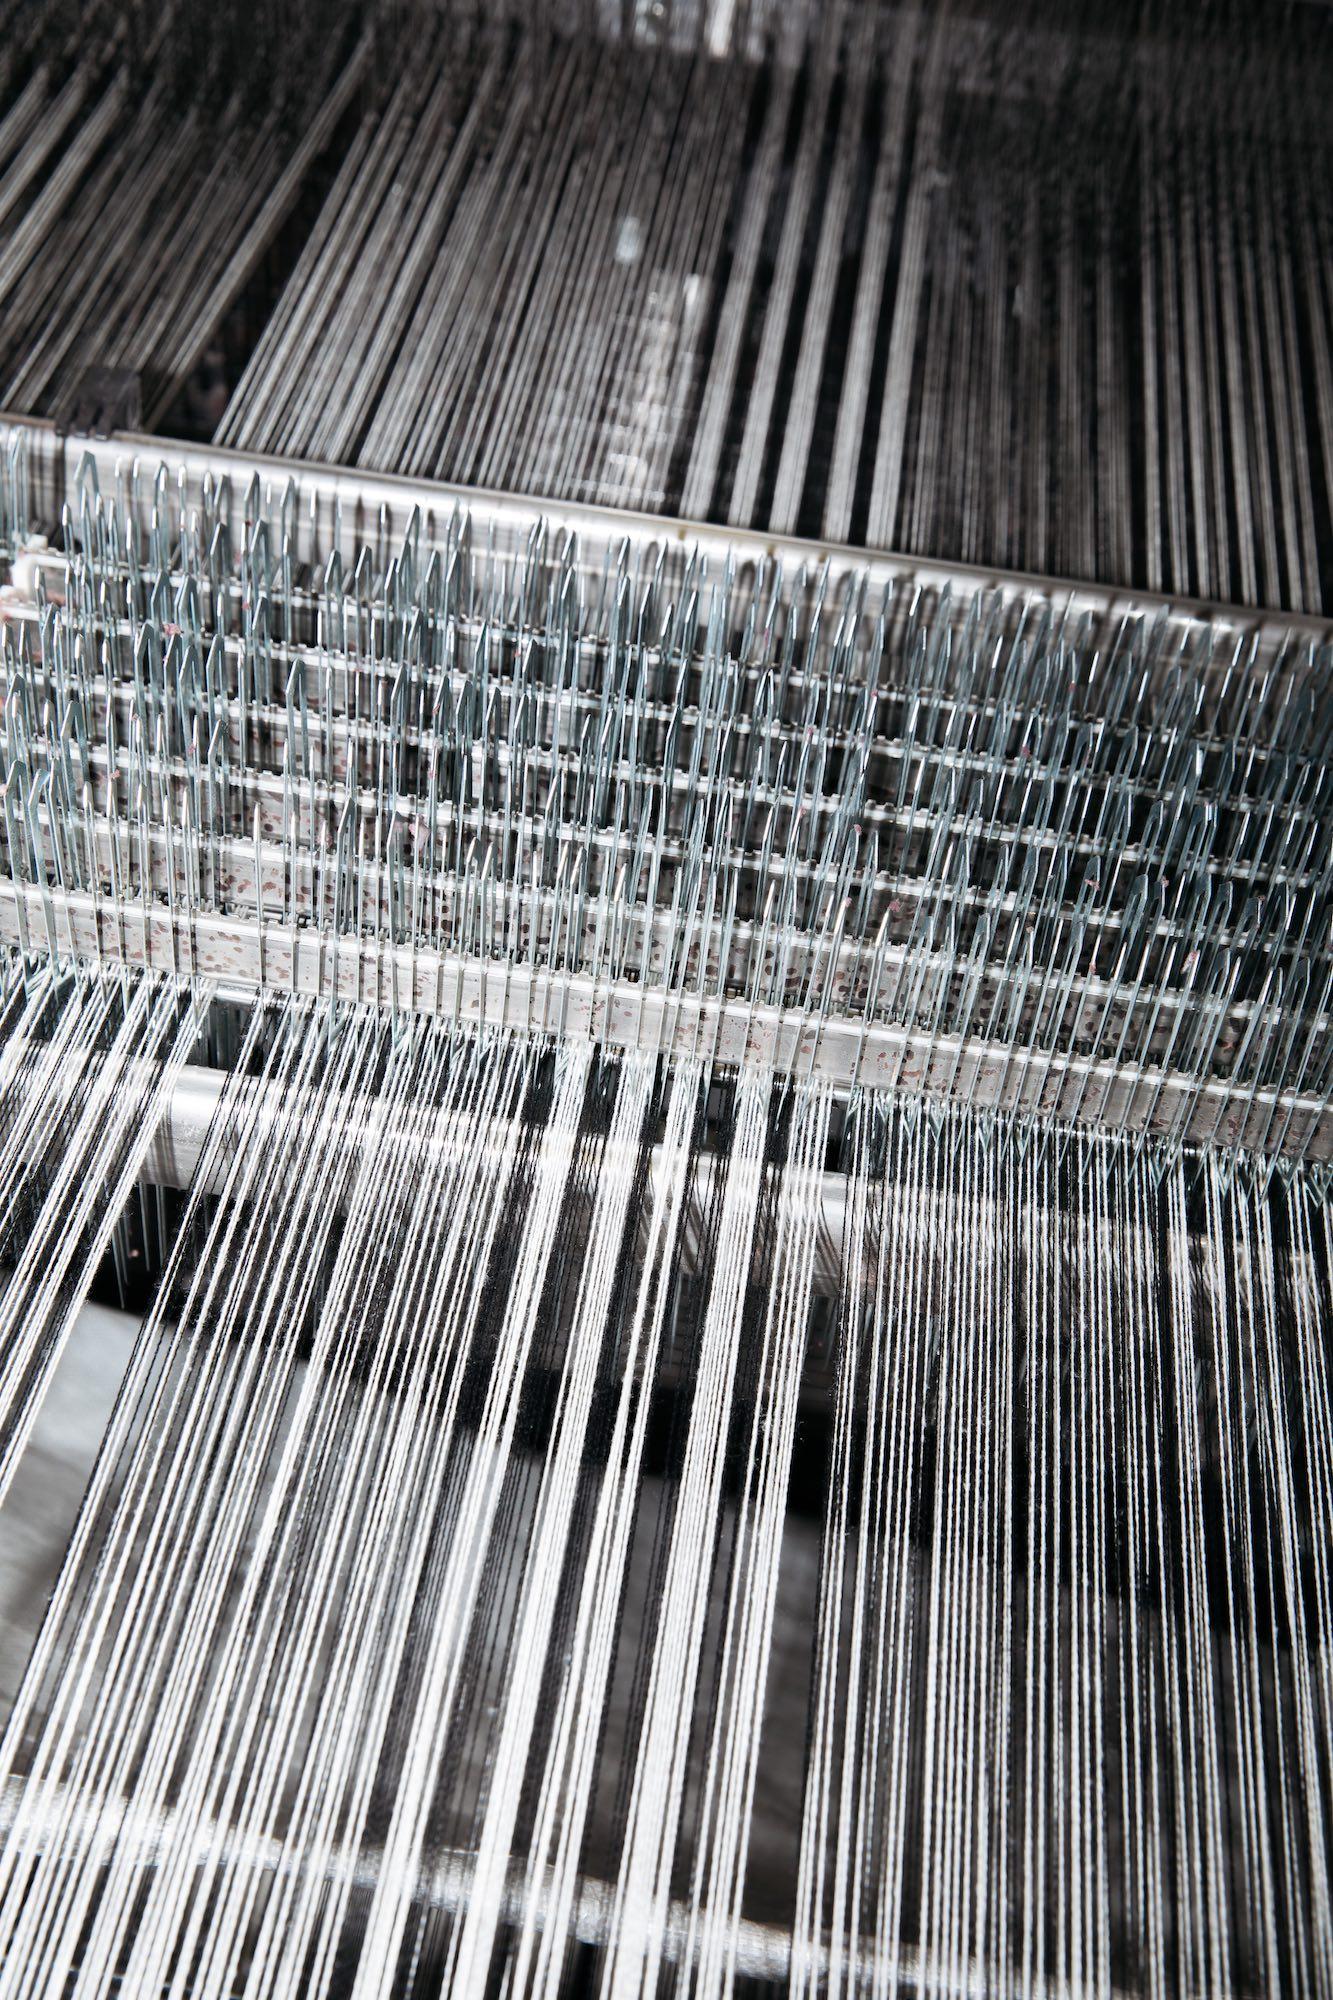 IGNANT-ACE Weaving Mill-Korschan (10 von 30)